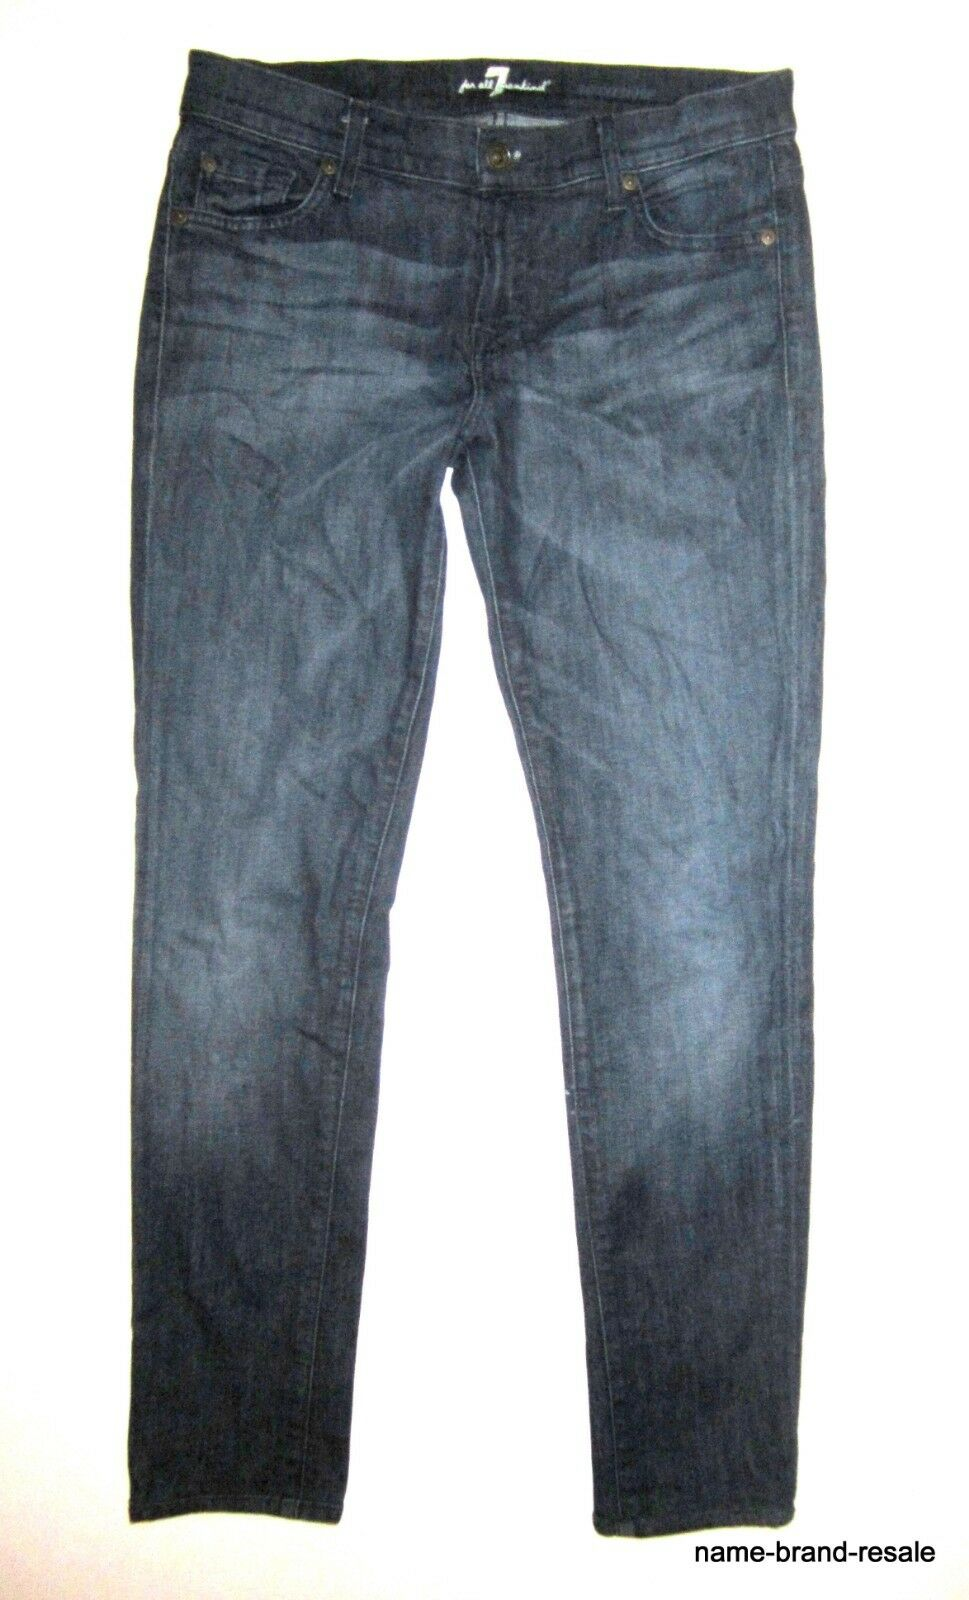 7 FOR ALL MANKIND ROXANNE Jeans Womens 28 x xxx  Skinny Slim Leg Dark Wash